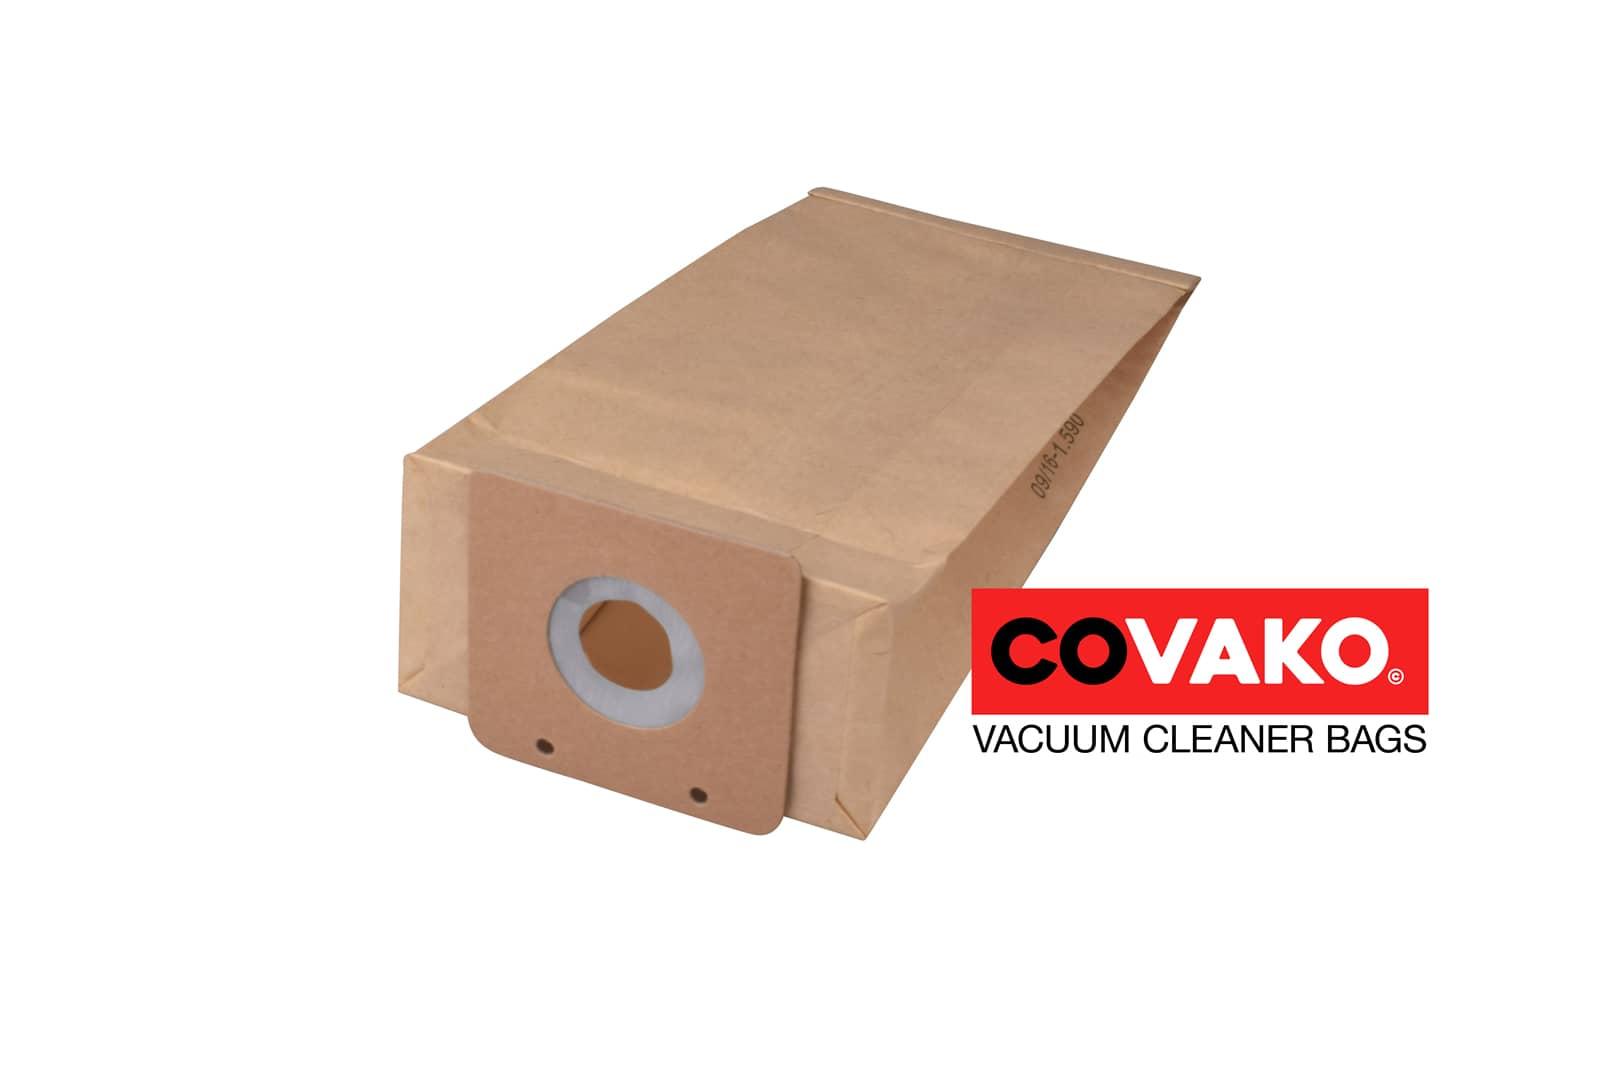 Kärcher T 7/1 / Paper - Kärcher vacuum cleaner bags